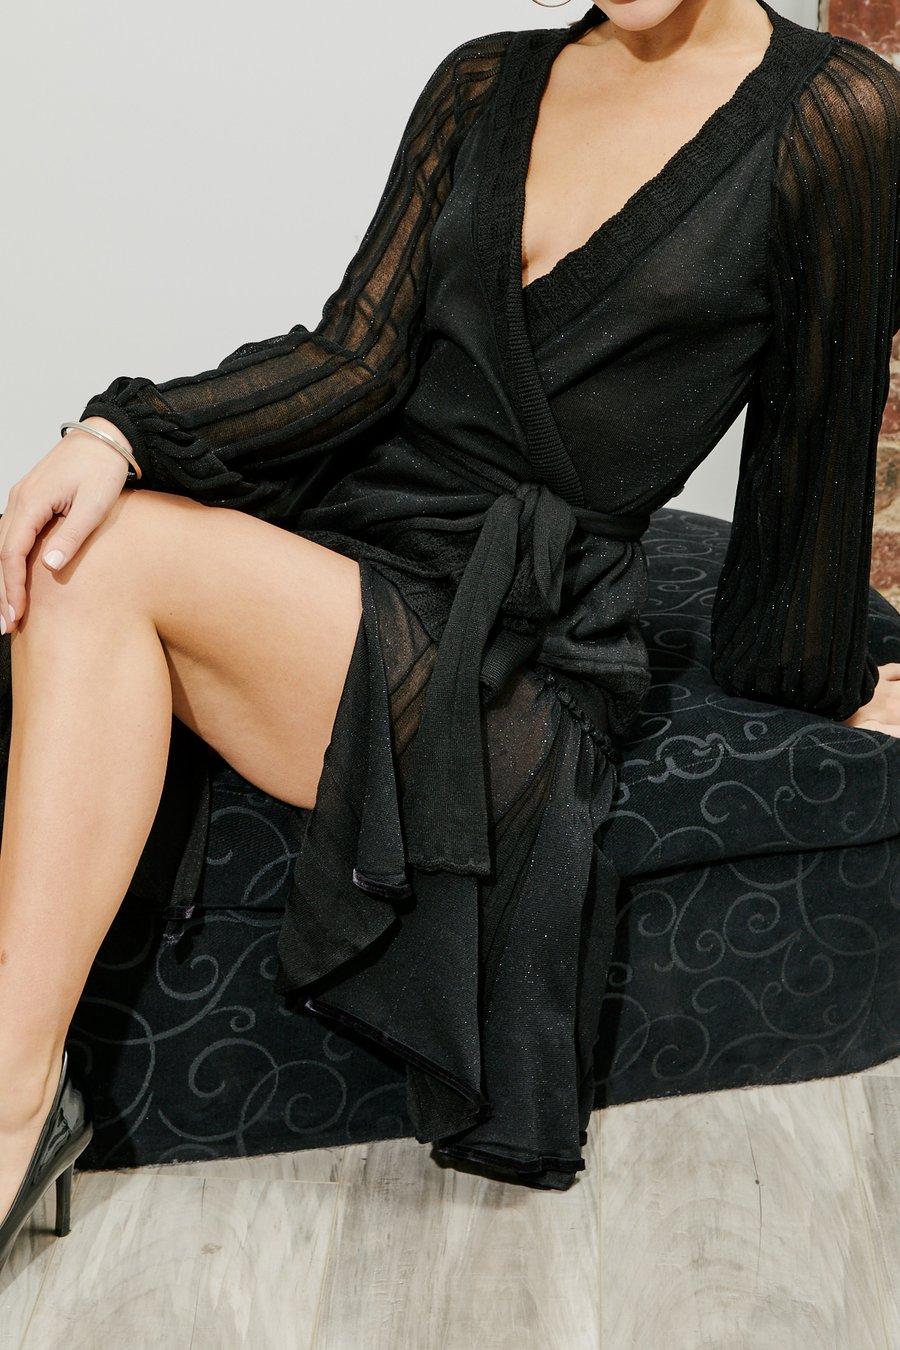 Image of Cross Over Knitted Cardigan JNT-102 Dancewear latin ballroom